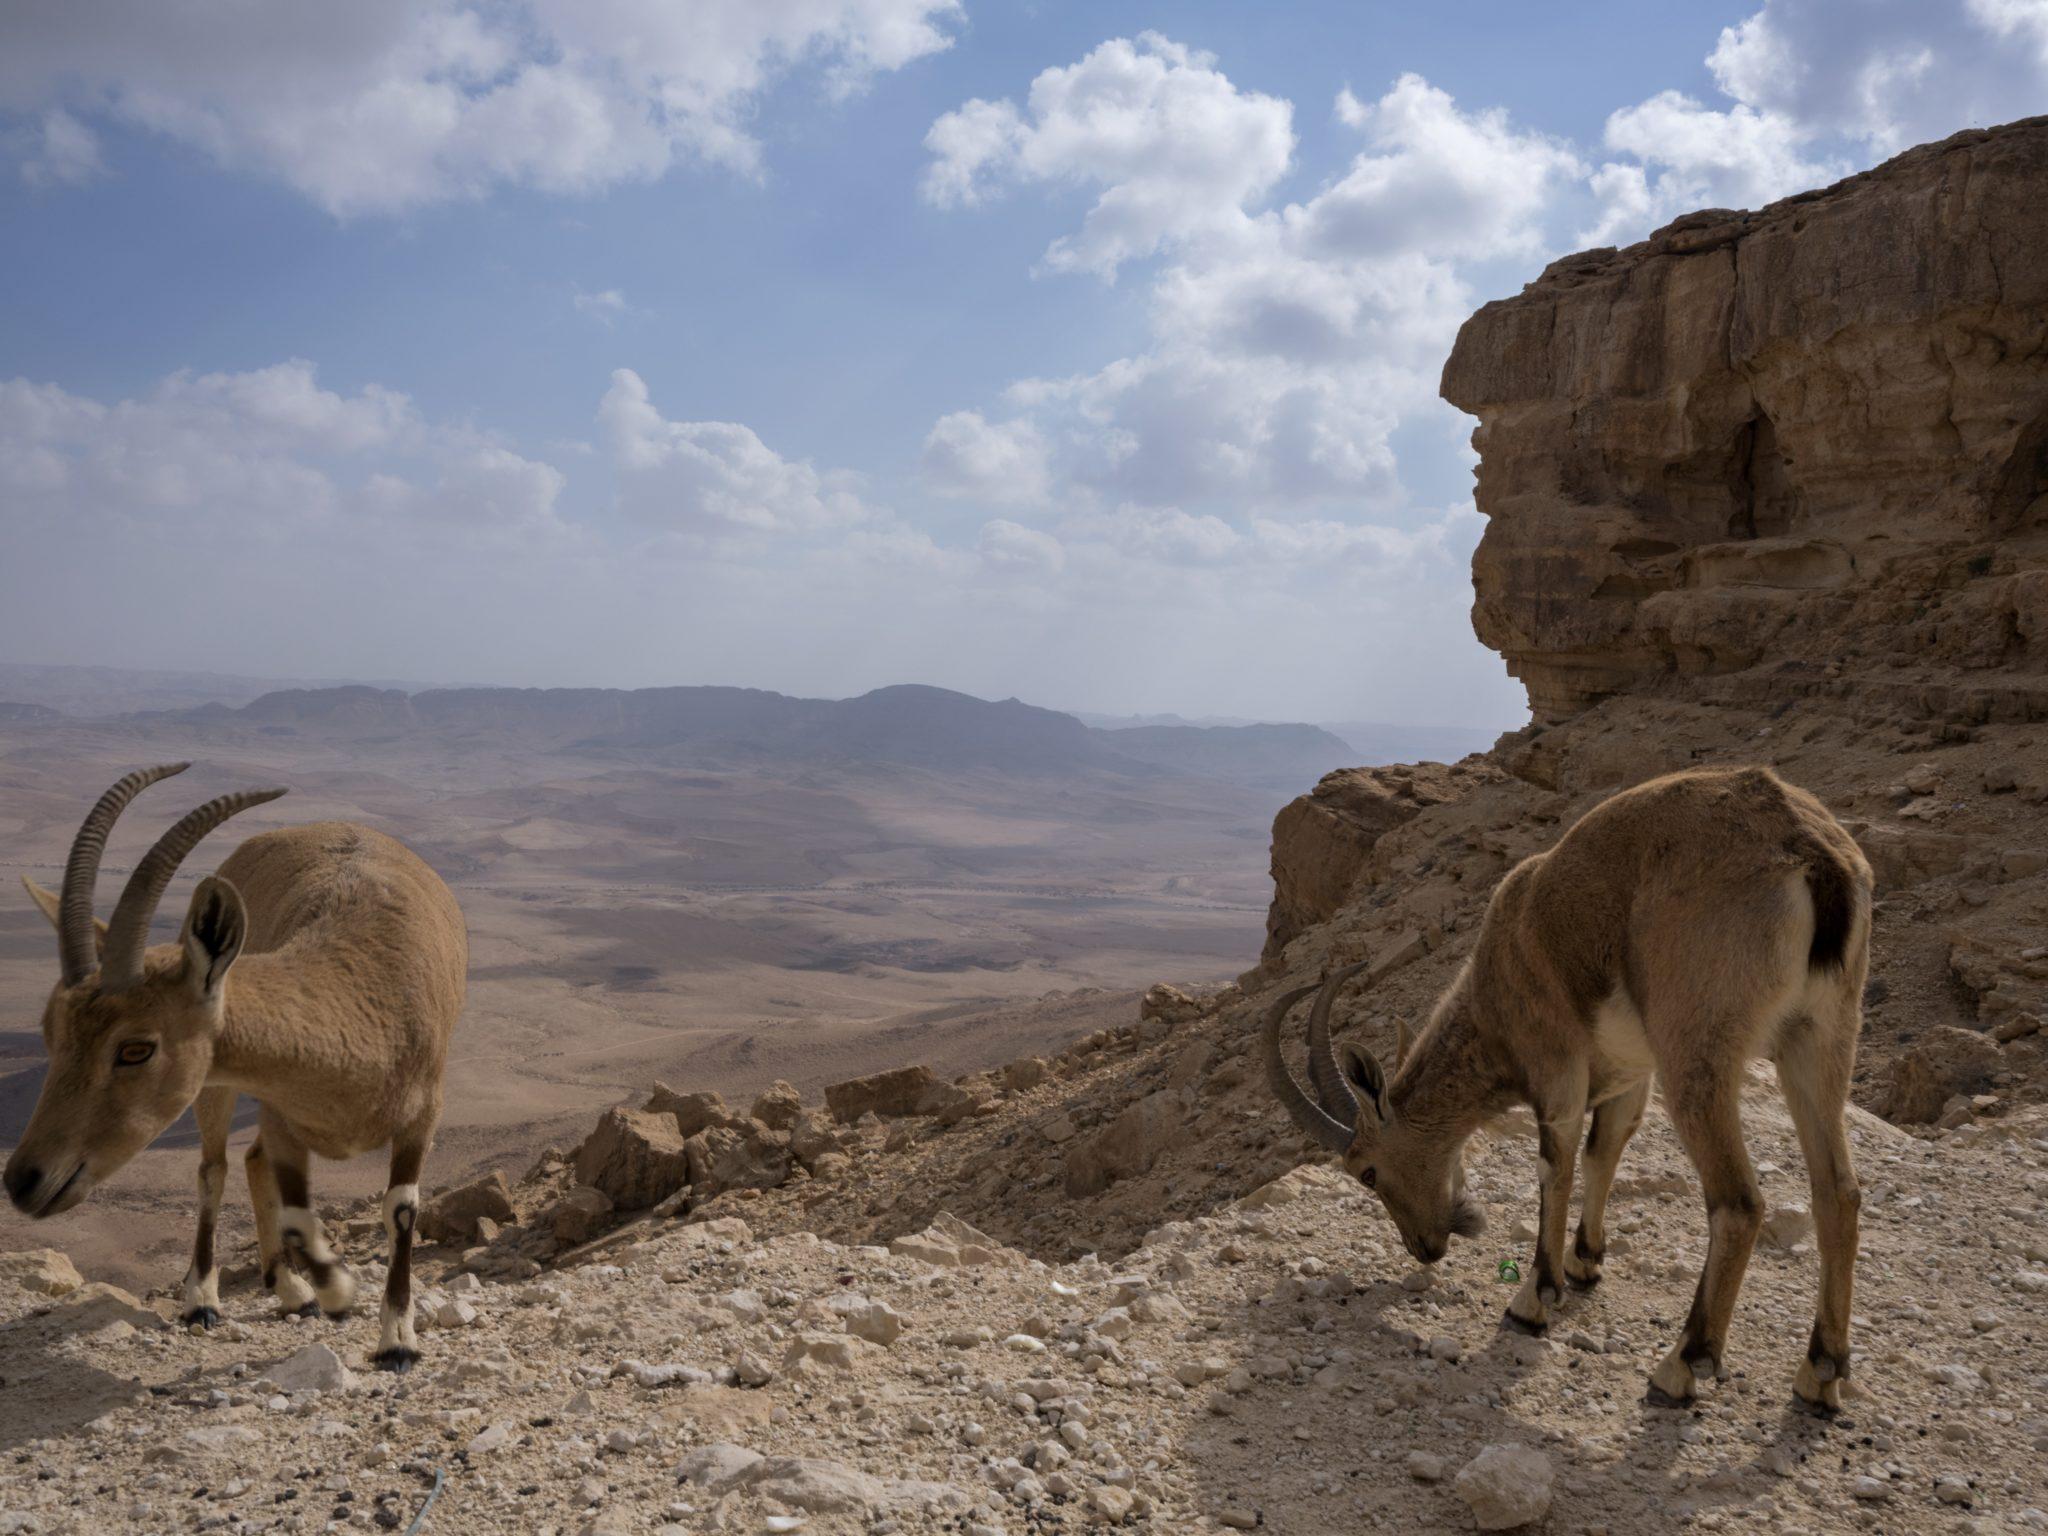 Izrael: koziorożec (Capra nubiana) żeruje nad kraterem Mitzpe Ramon na pustyni Negew, fot: Jim Hollander, PAP/EPA